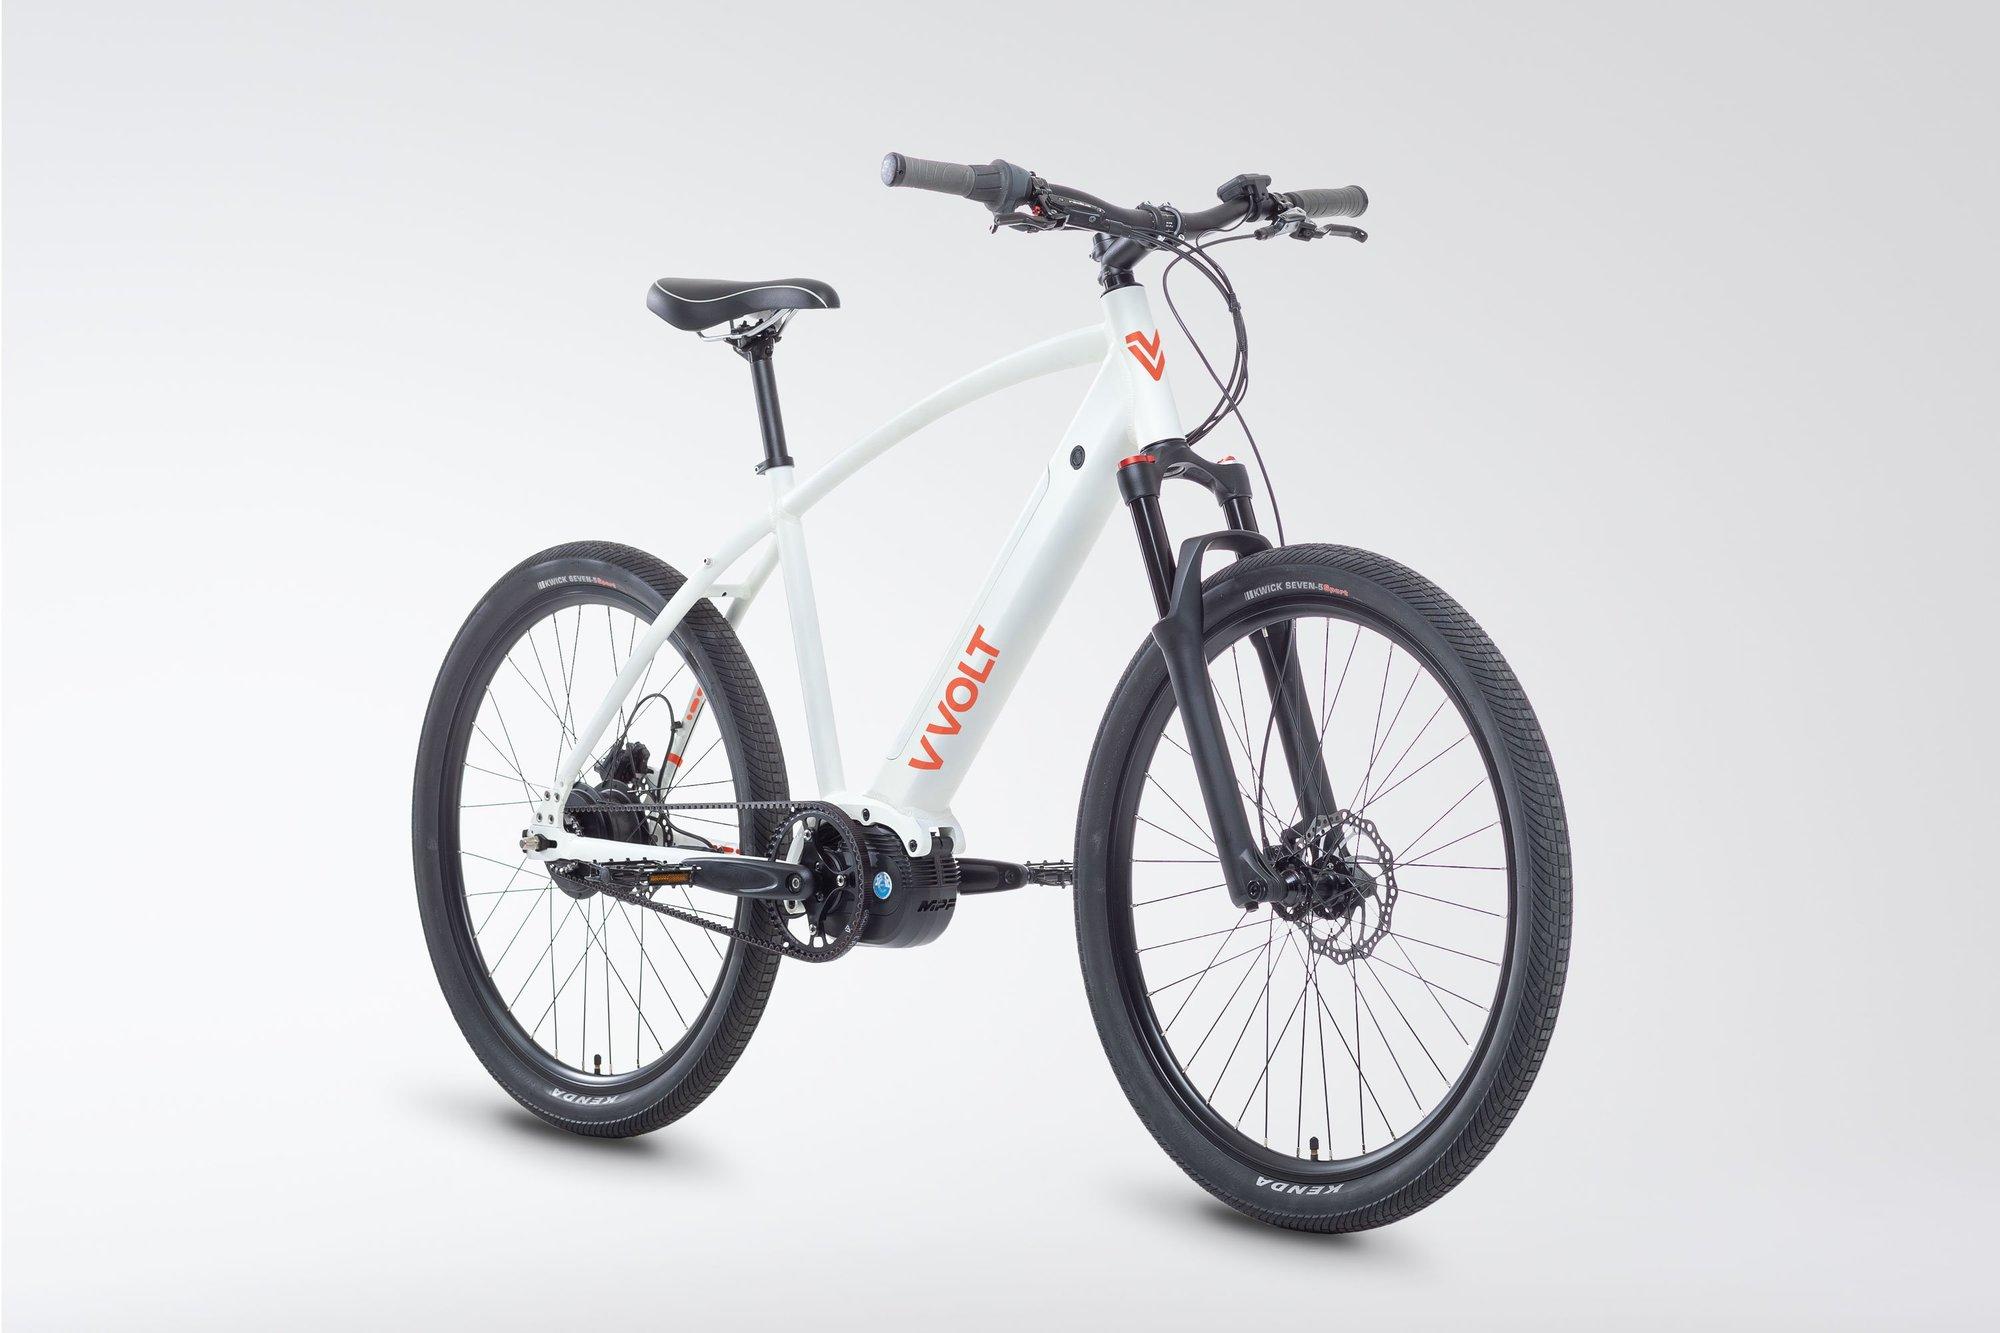 Vvolt Sirius mid-drive trekking bike